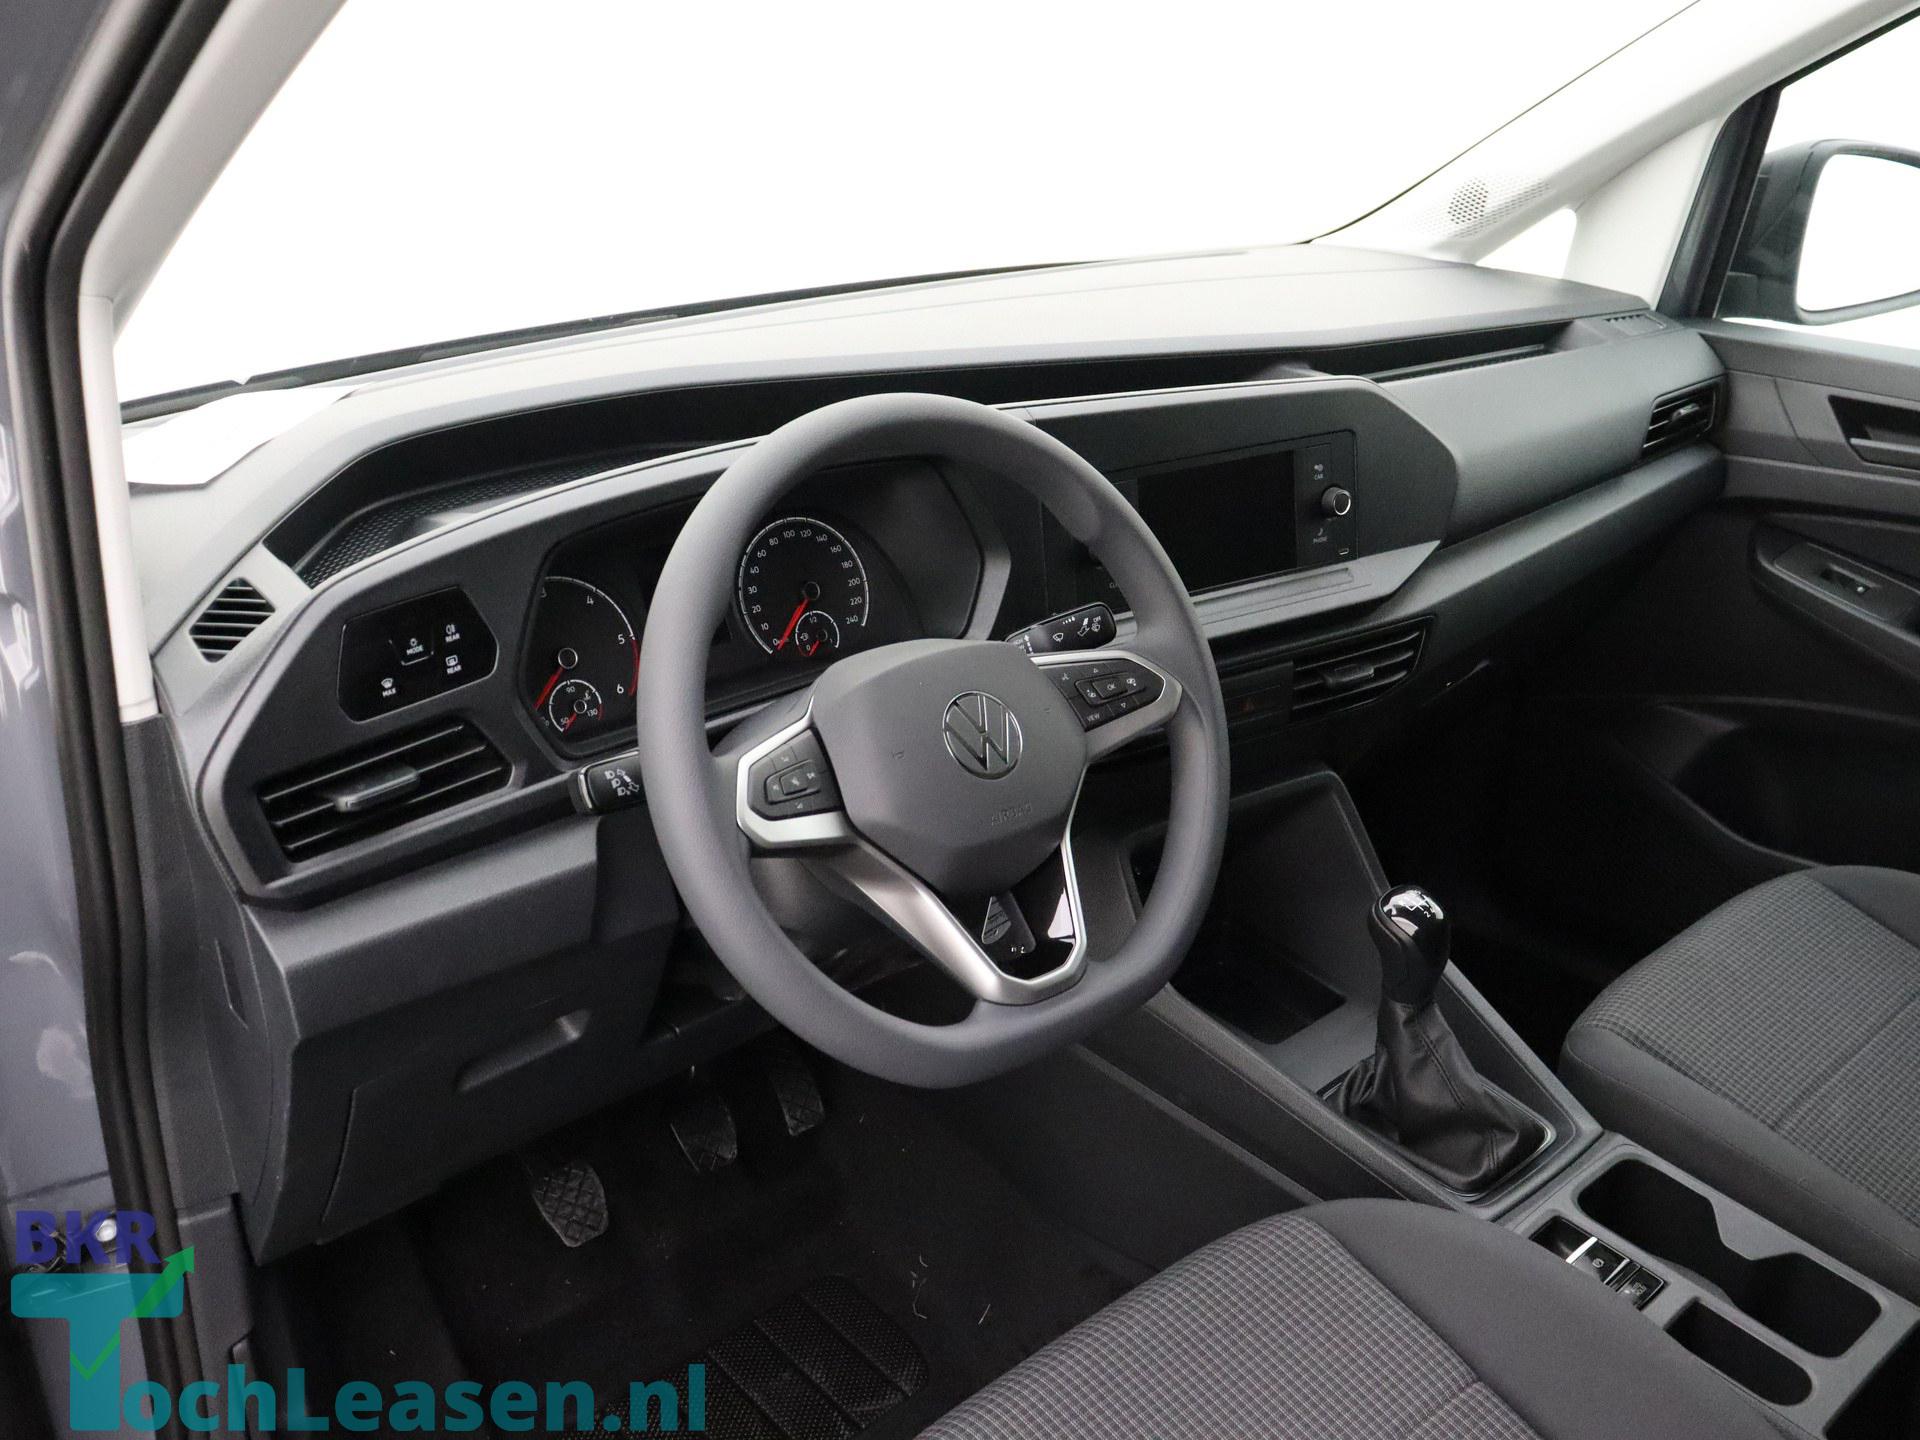 BKR toch leasen - Volkswagen Caddy - Grijs 3